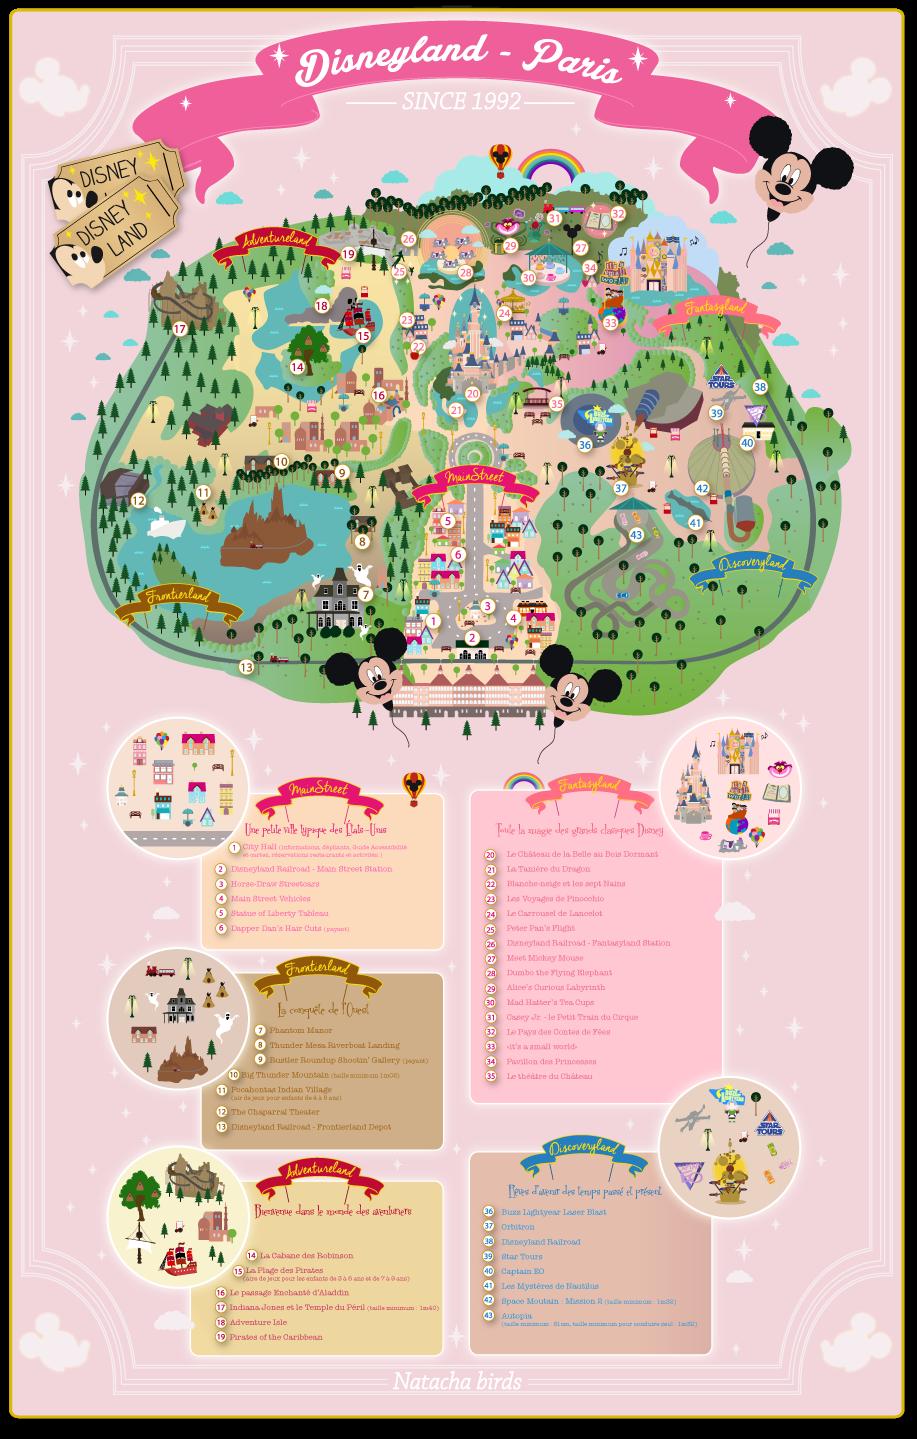 Mapa De Disneyland Paris Para Imprimir.Pin By Elva Gonzalez On Imprimir Disneyland Paris